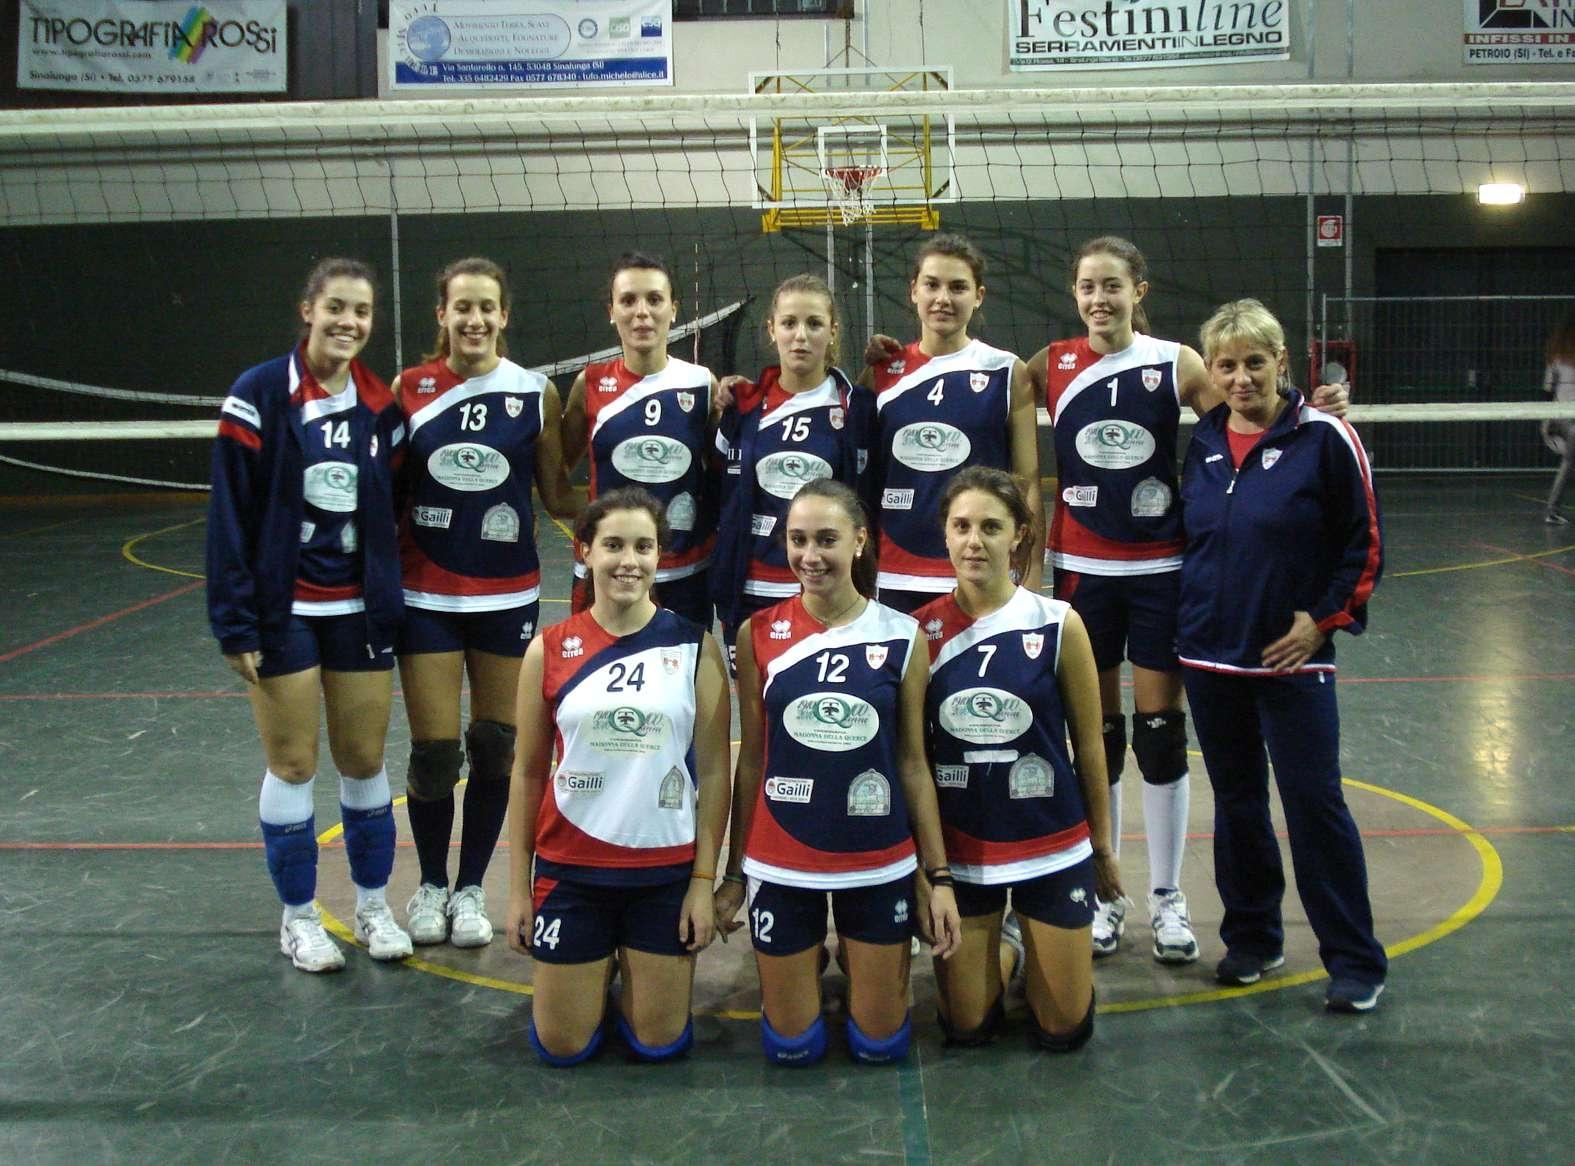 Volley: l'Under 18 della Polisportiva Montepulciano vince il derby con la Poliziana